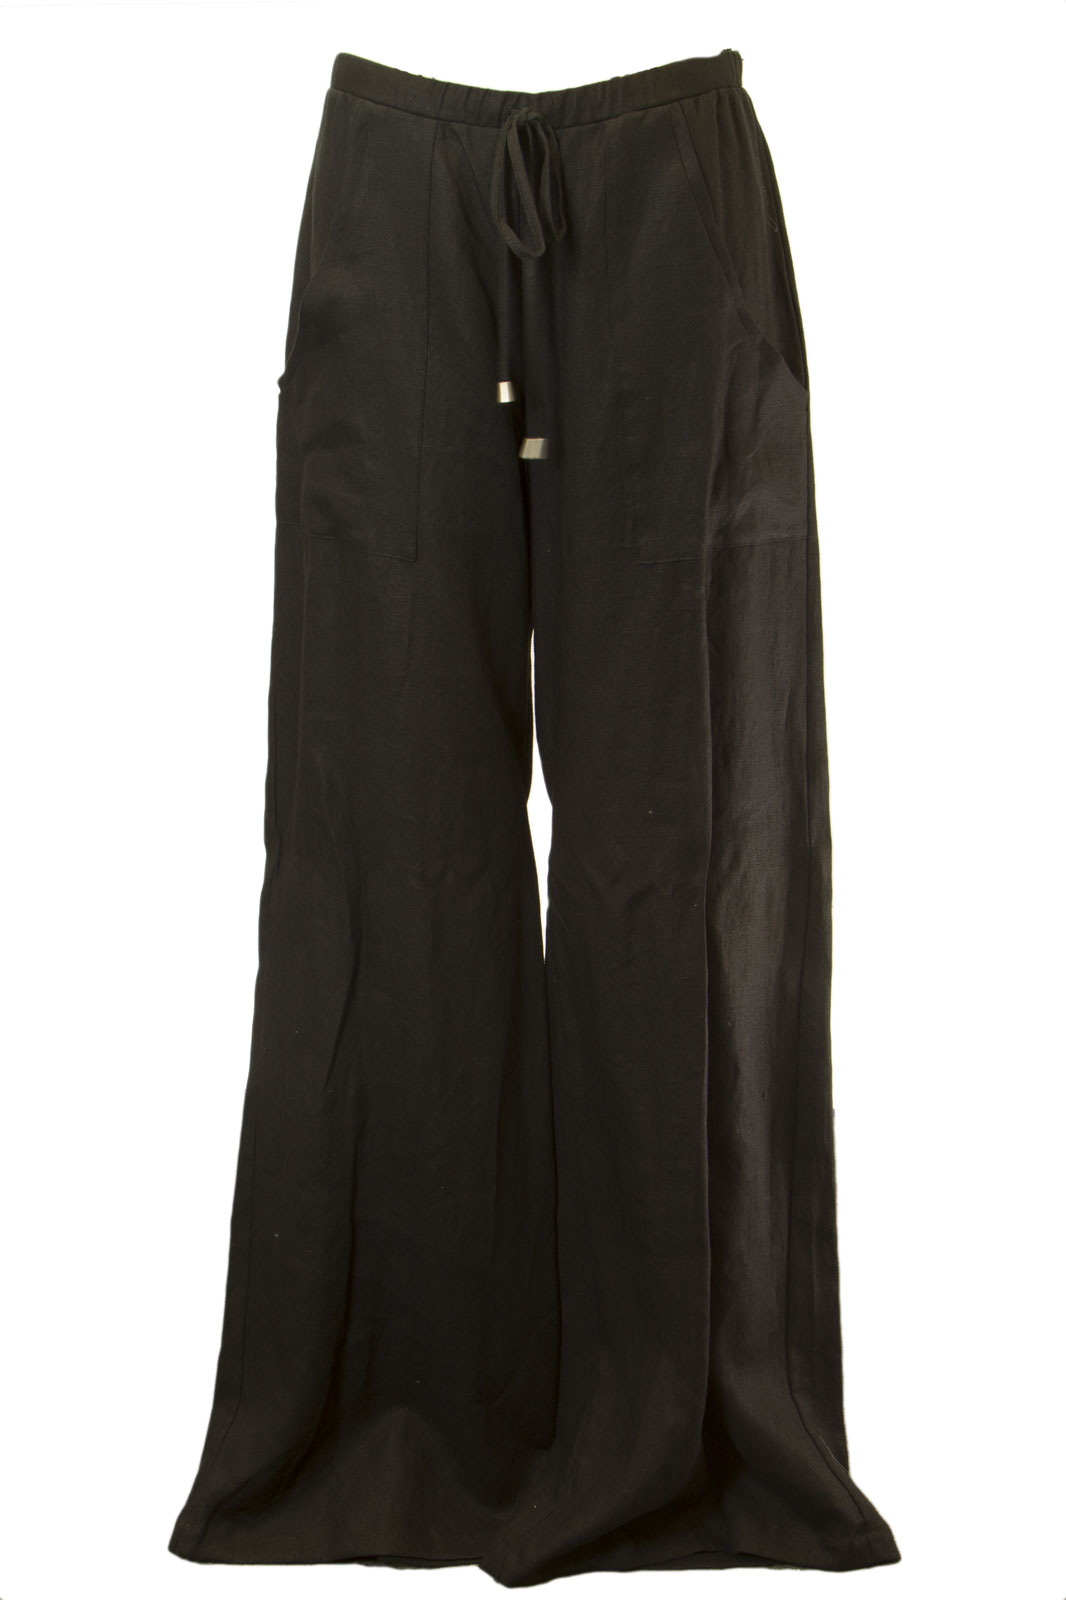 ANALILI Women/'s Linen Wide Lounge Pants 212J18 $155 NWT